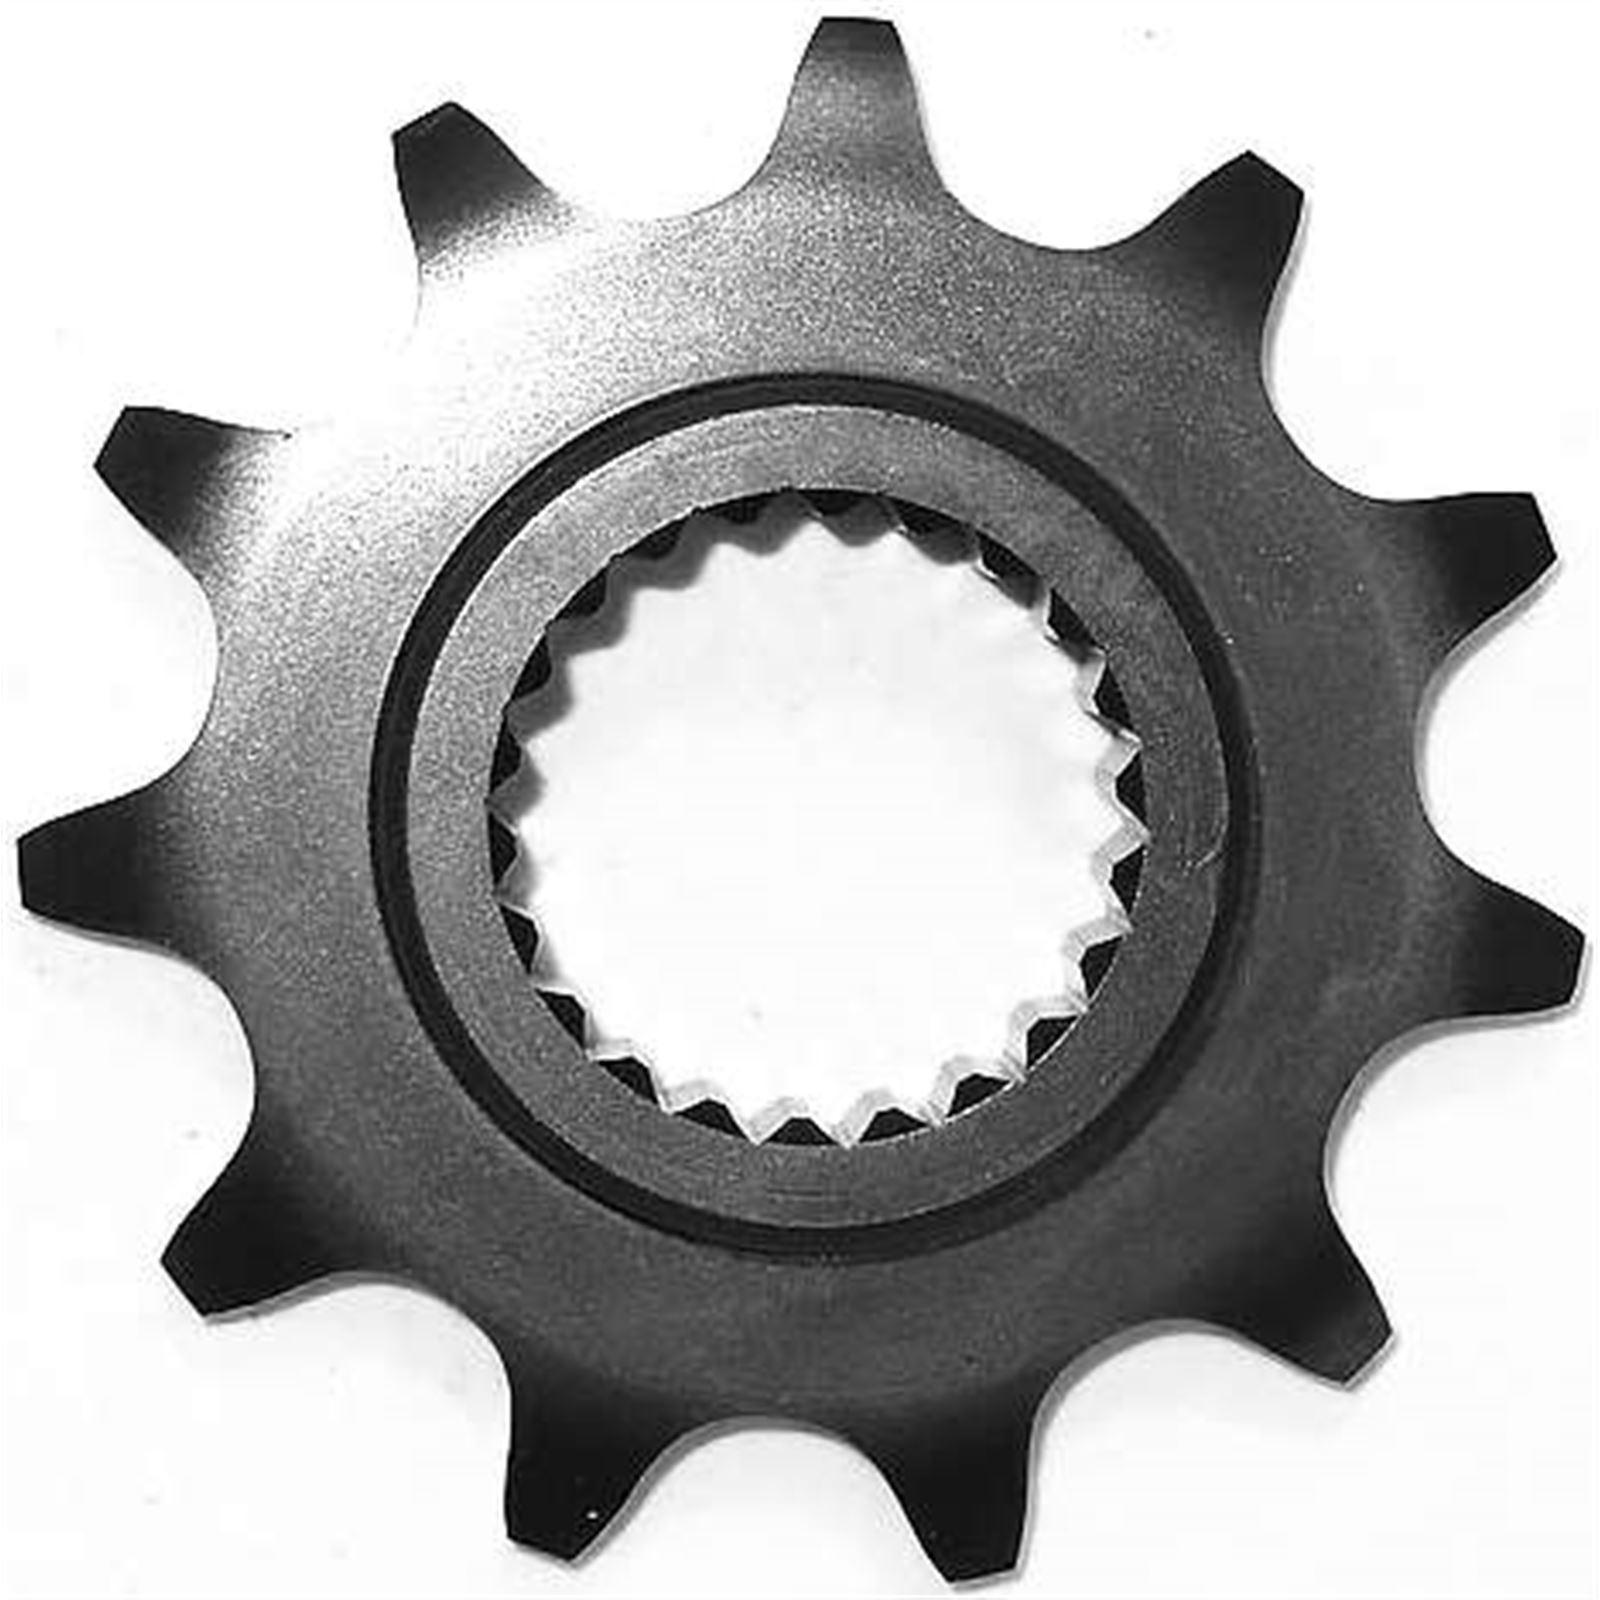 Sunstar Powerdrive Steel Countershaft Sprocket